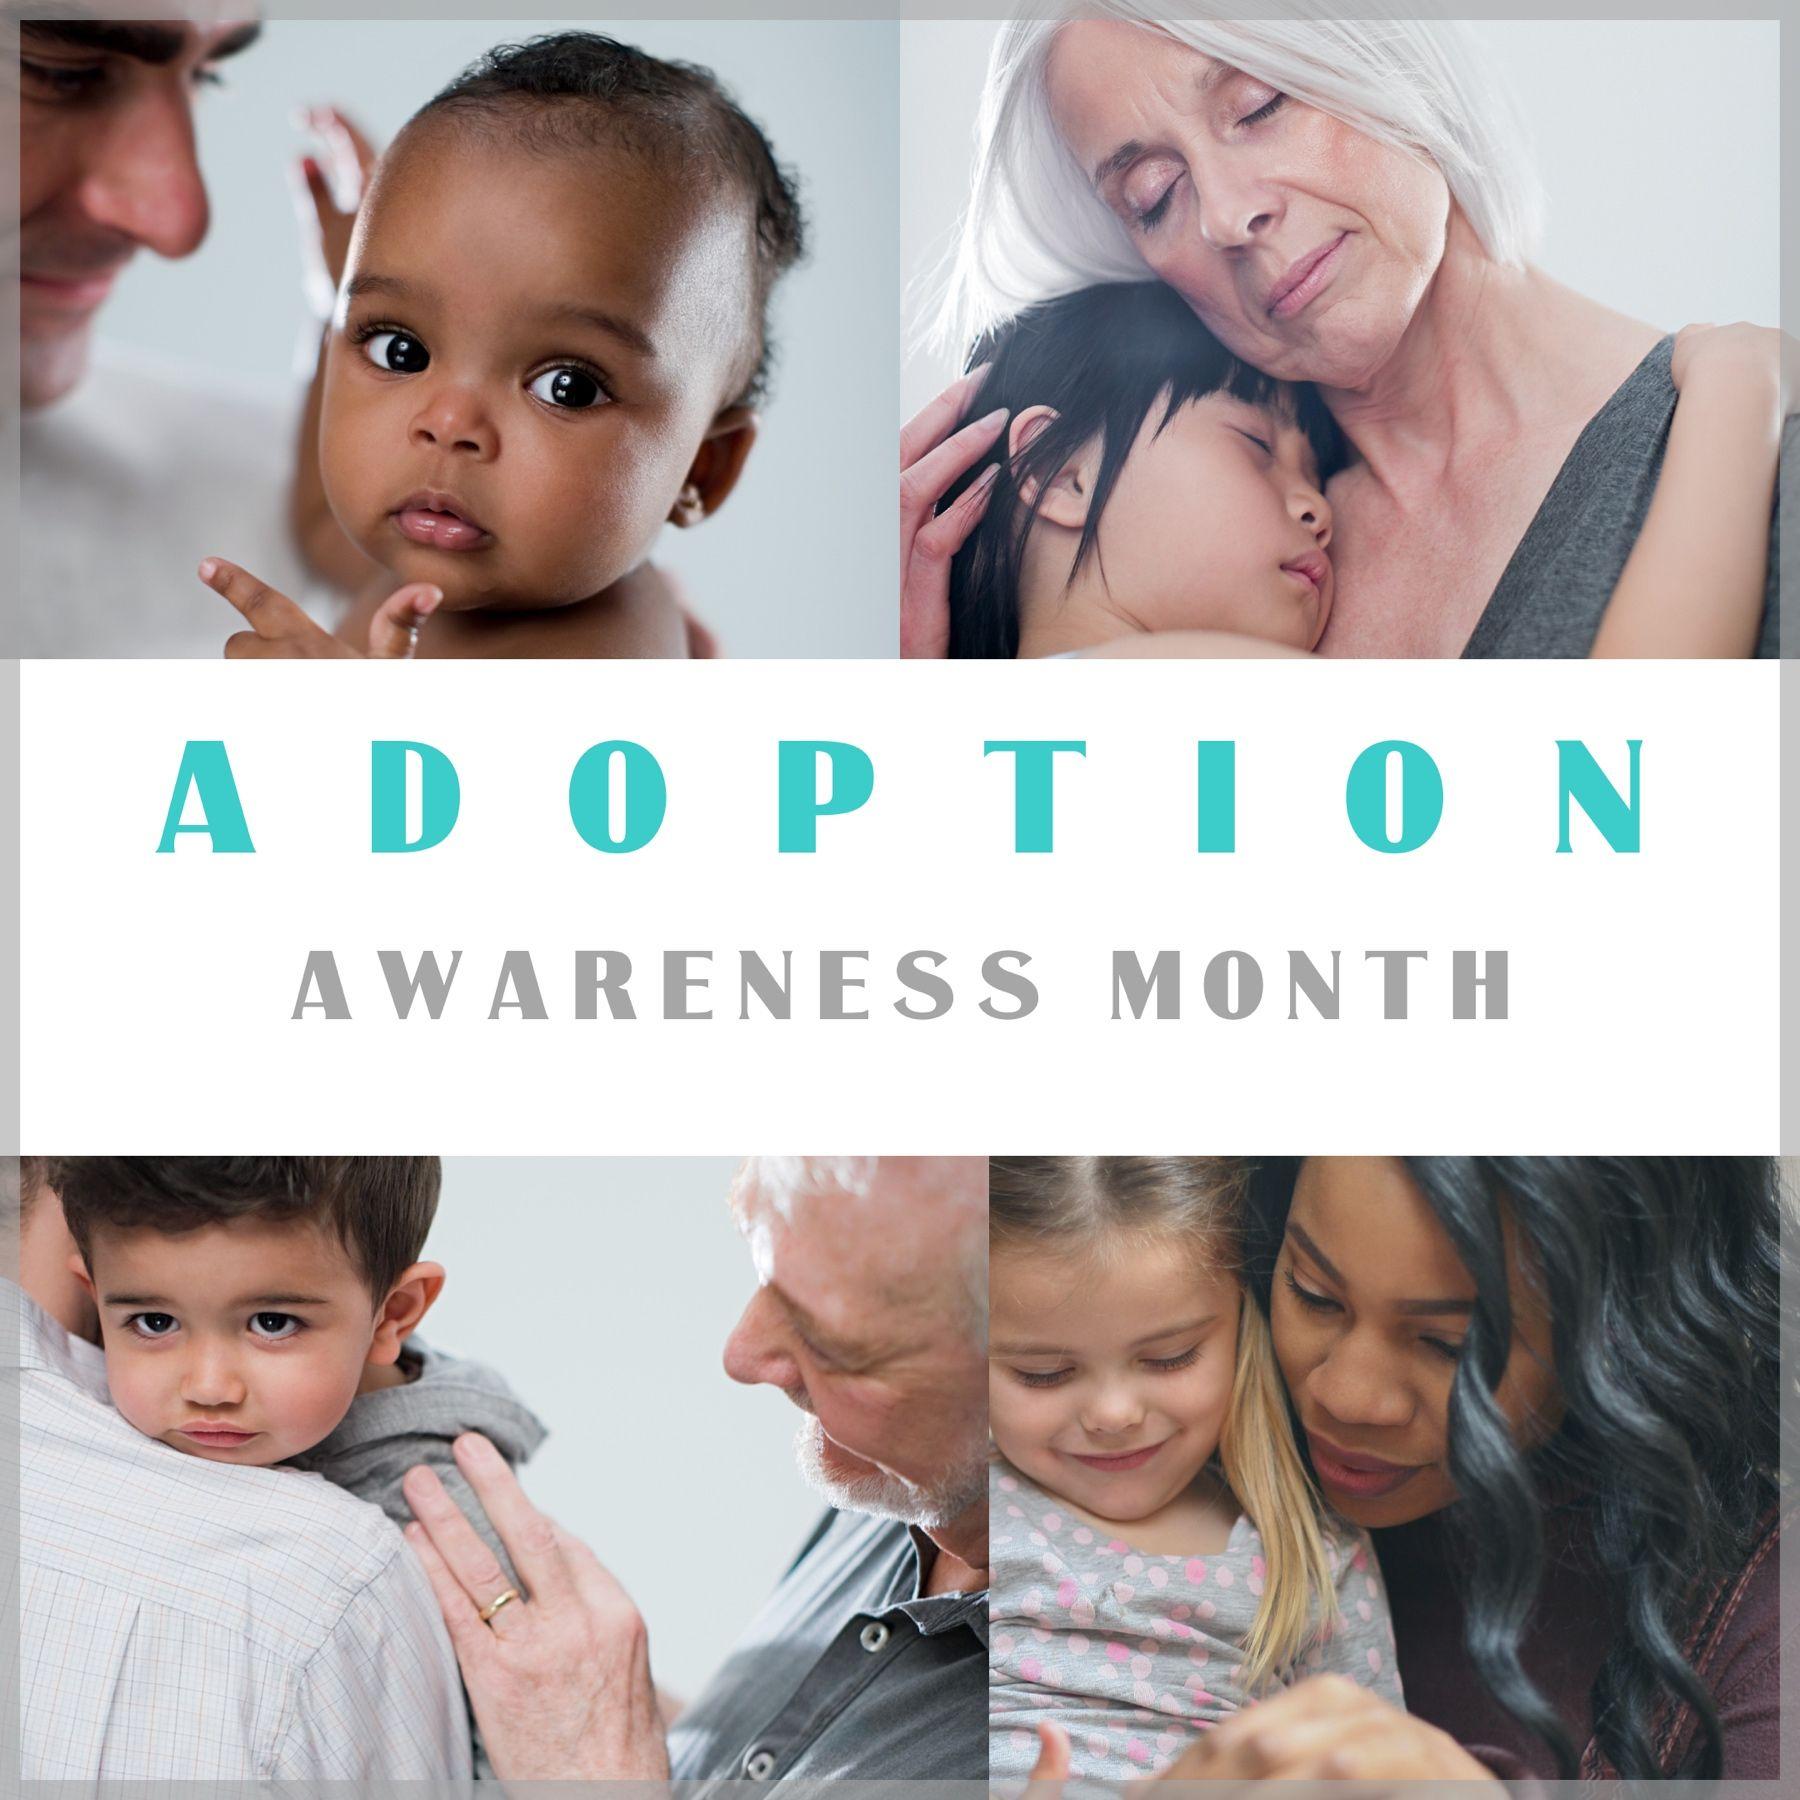 Explore Adoption | Children and family, Adoption, Children